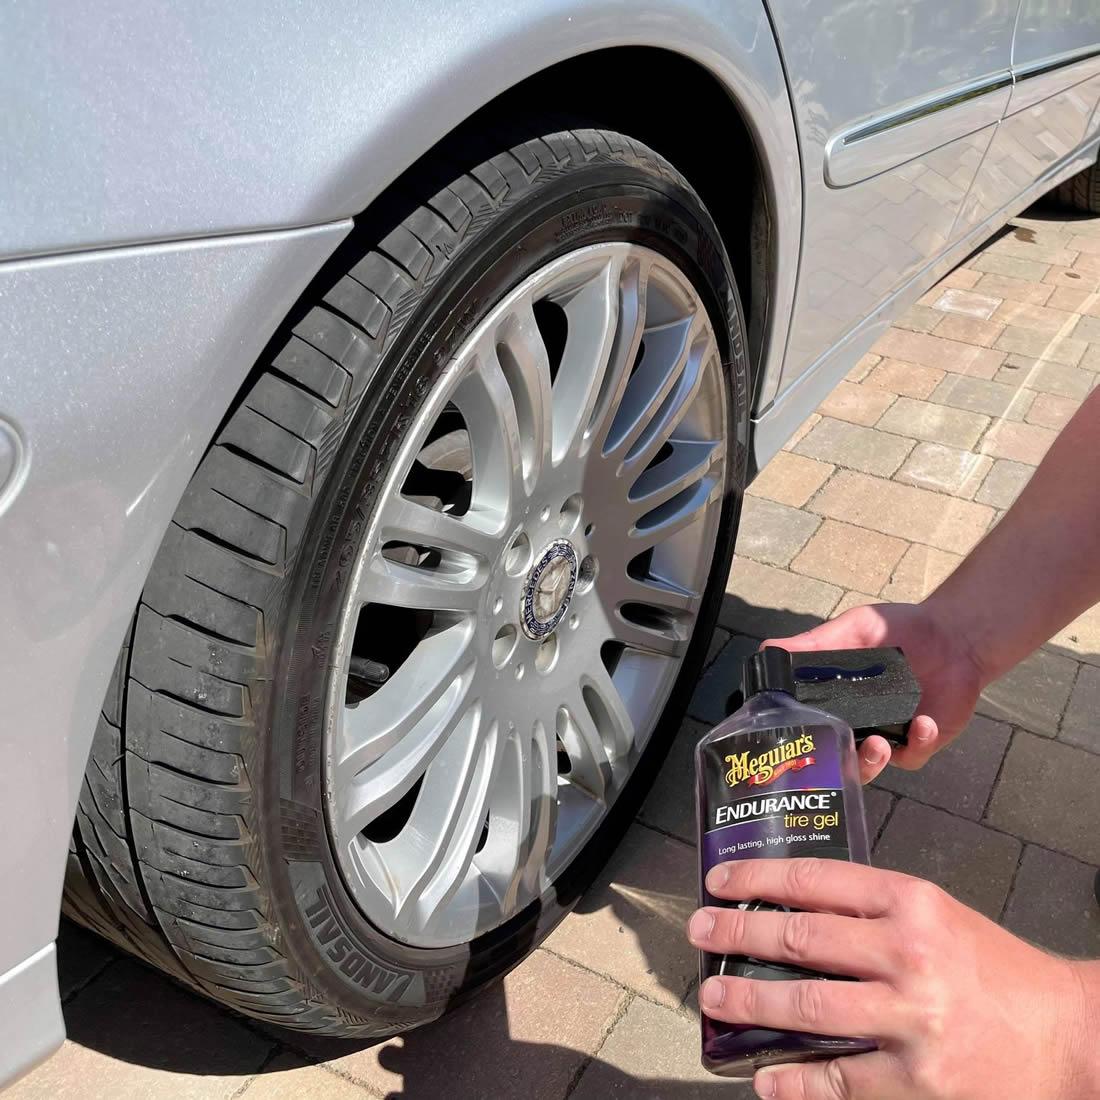 Meguiars Endurance Tyre Gel Application